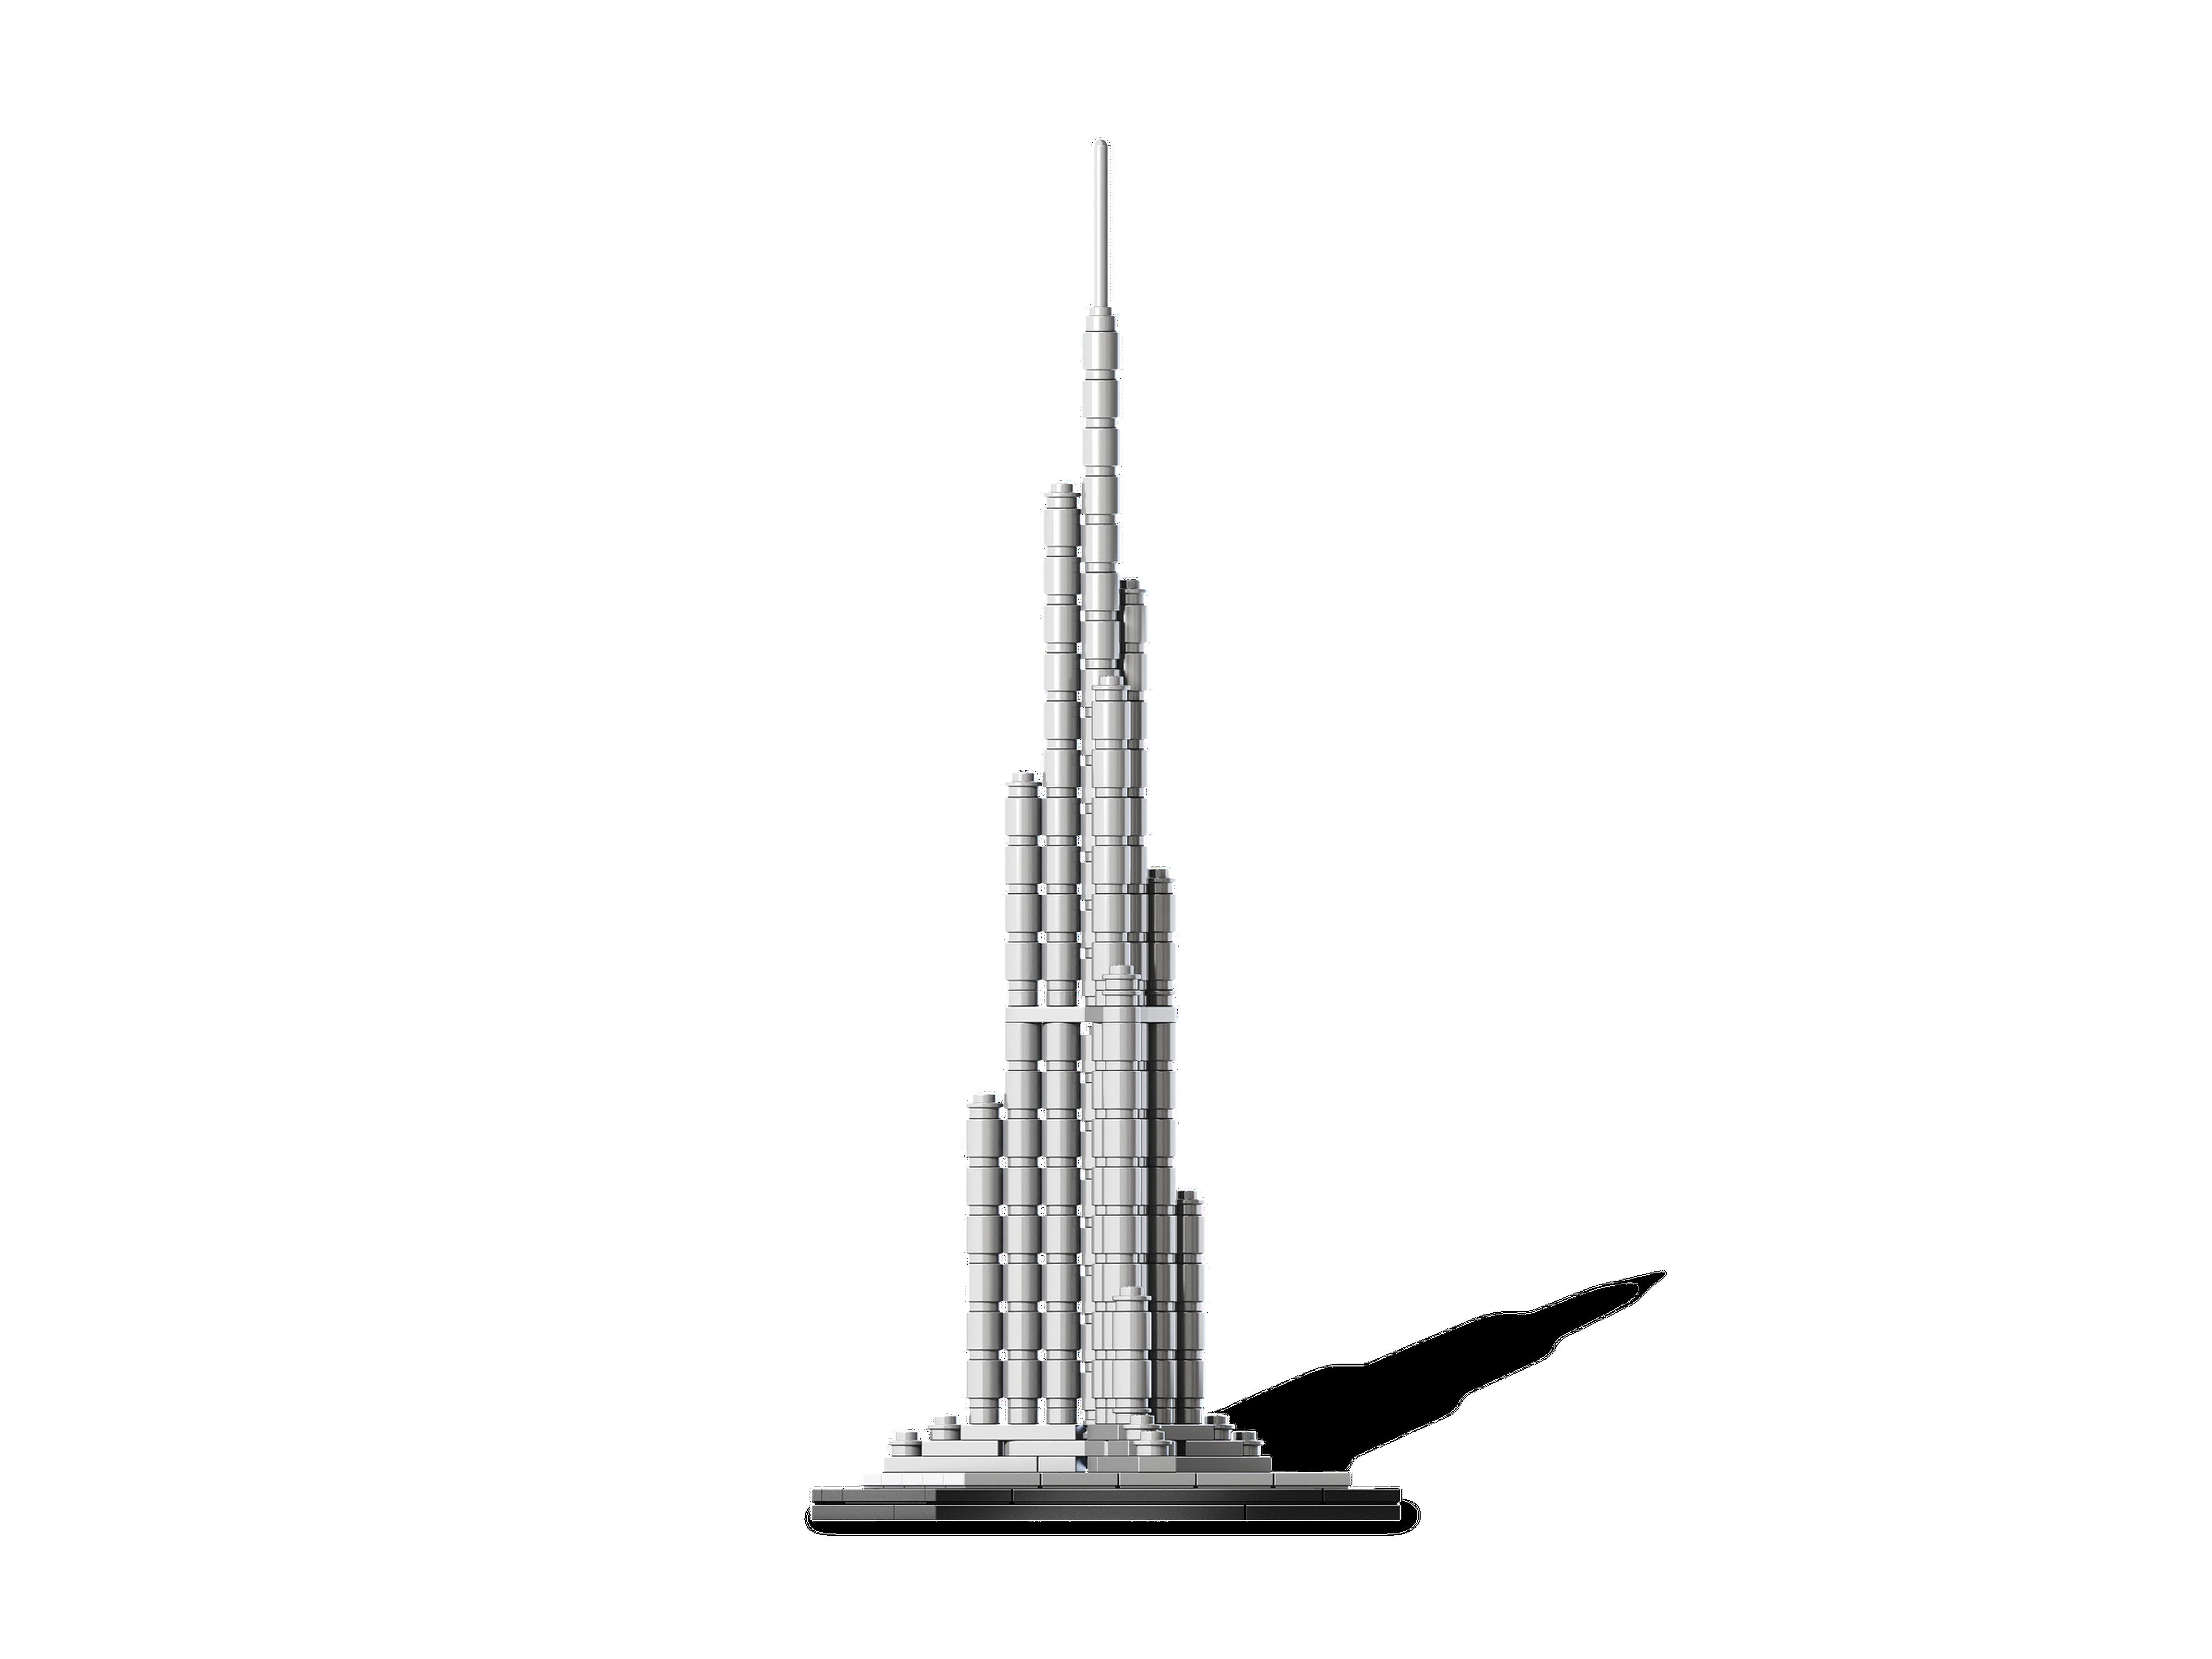 Burj Khalifa PNG Image